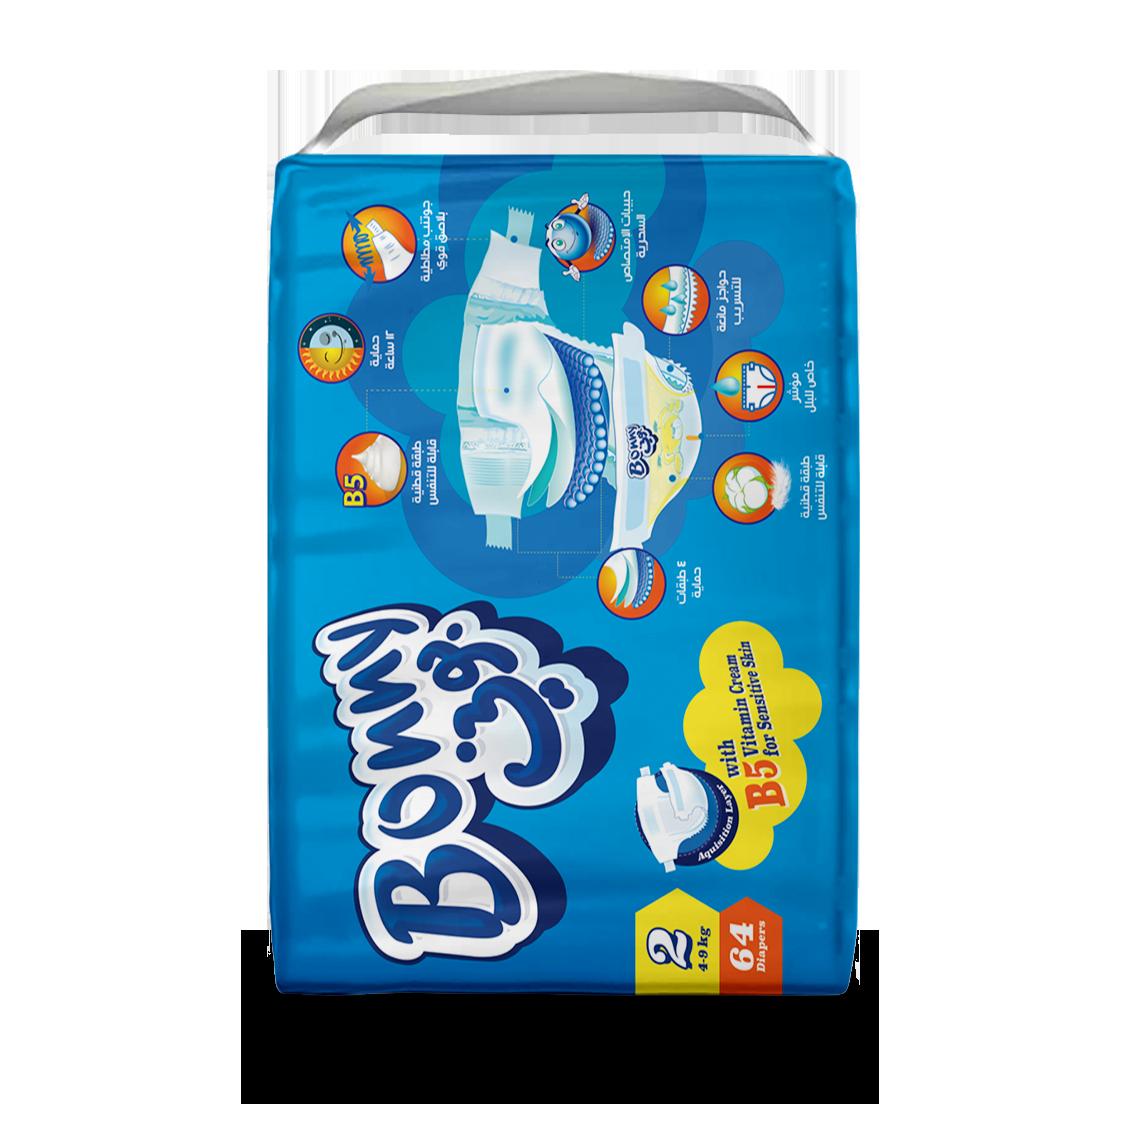 Bonny Packaging